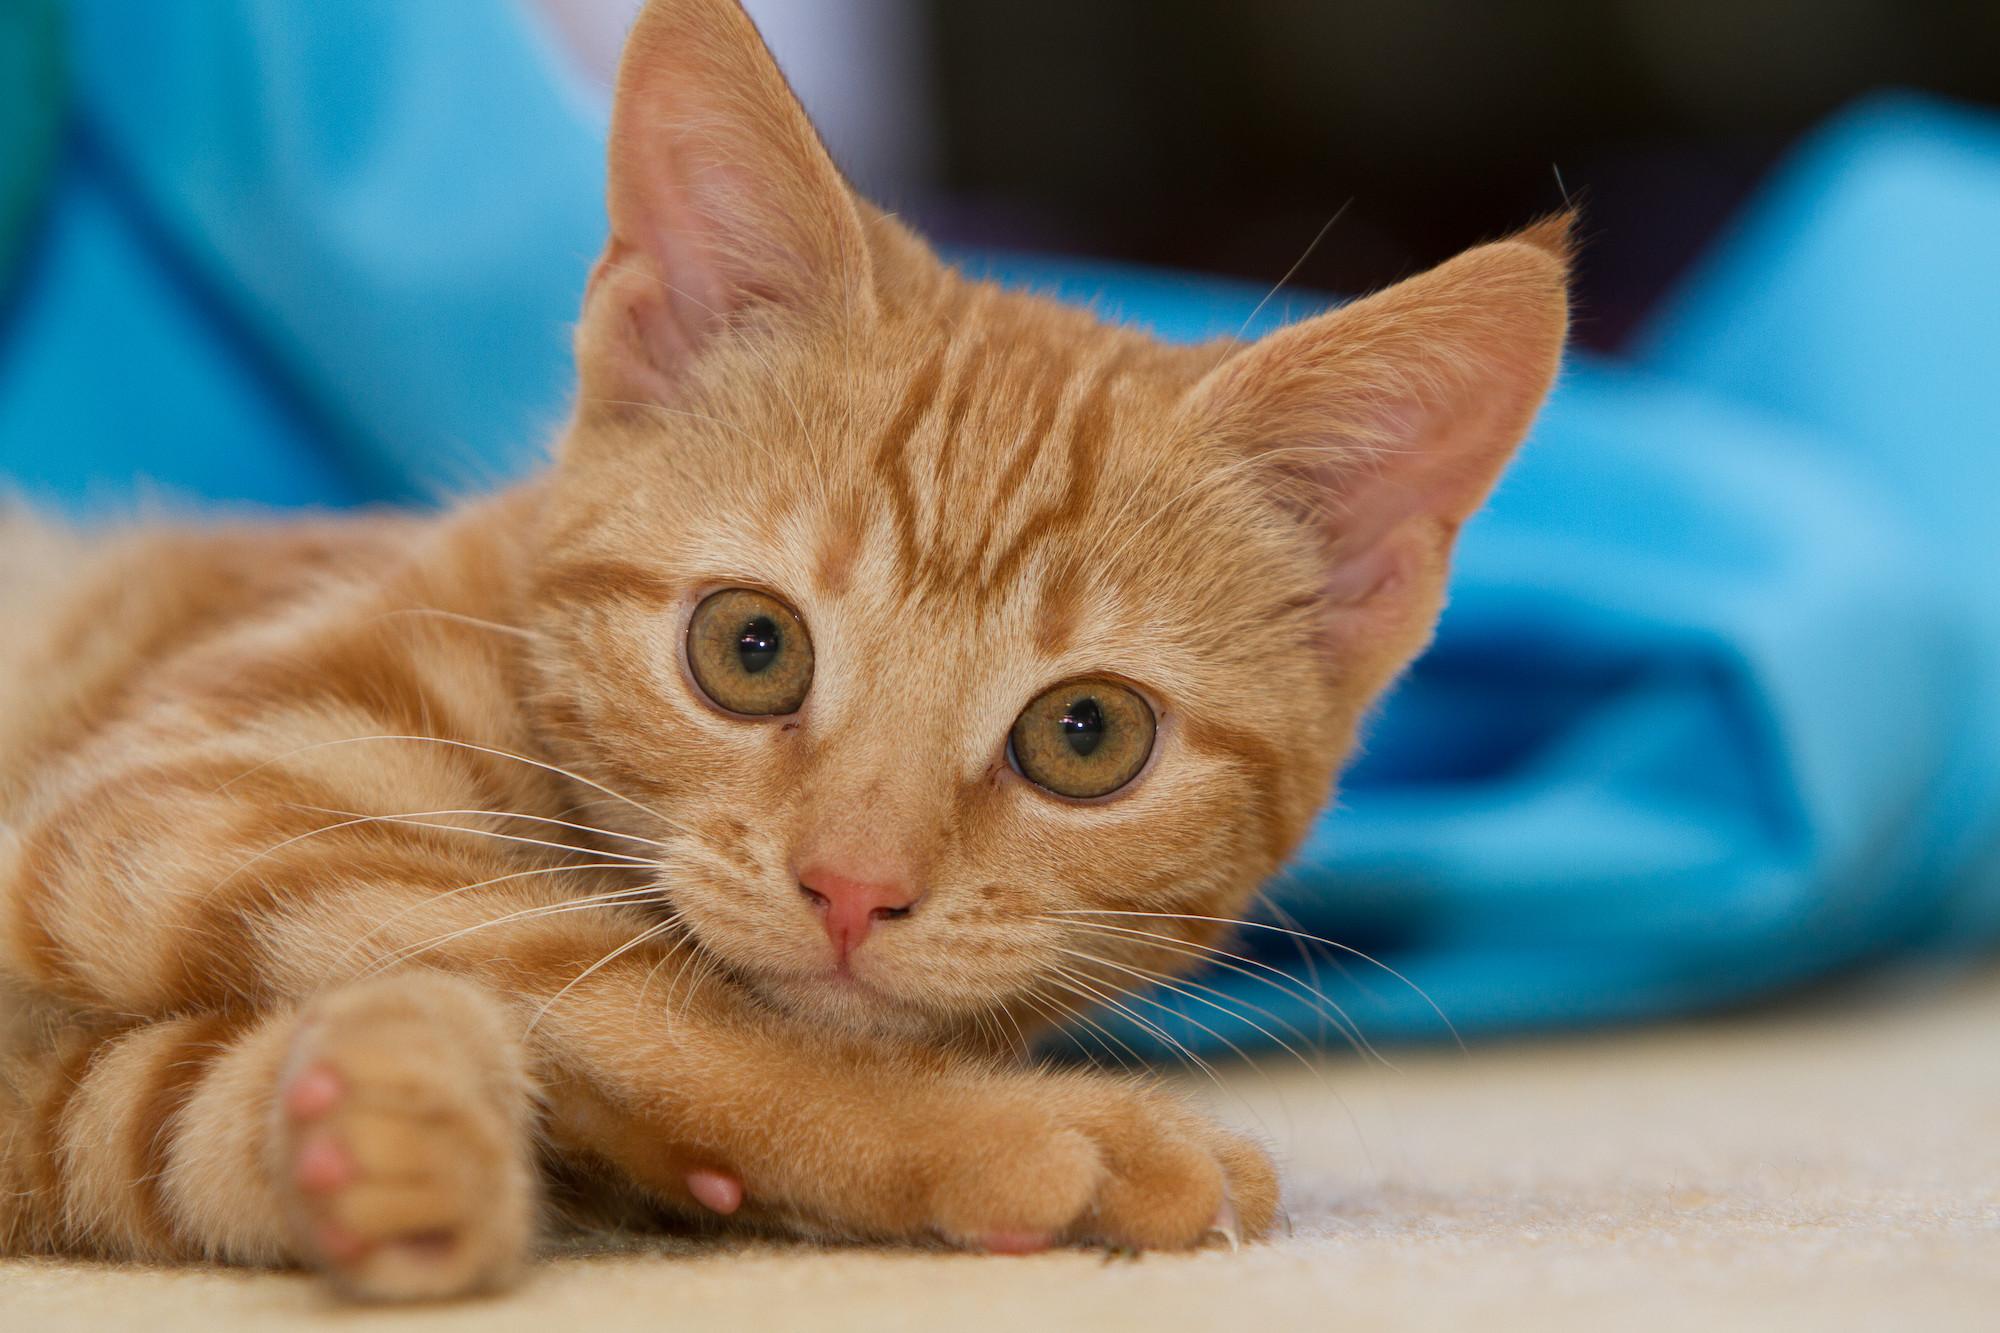 Ear mites in cats | Treatment & symptoms | Blue Cross